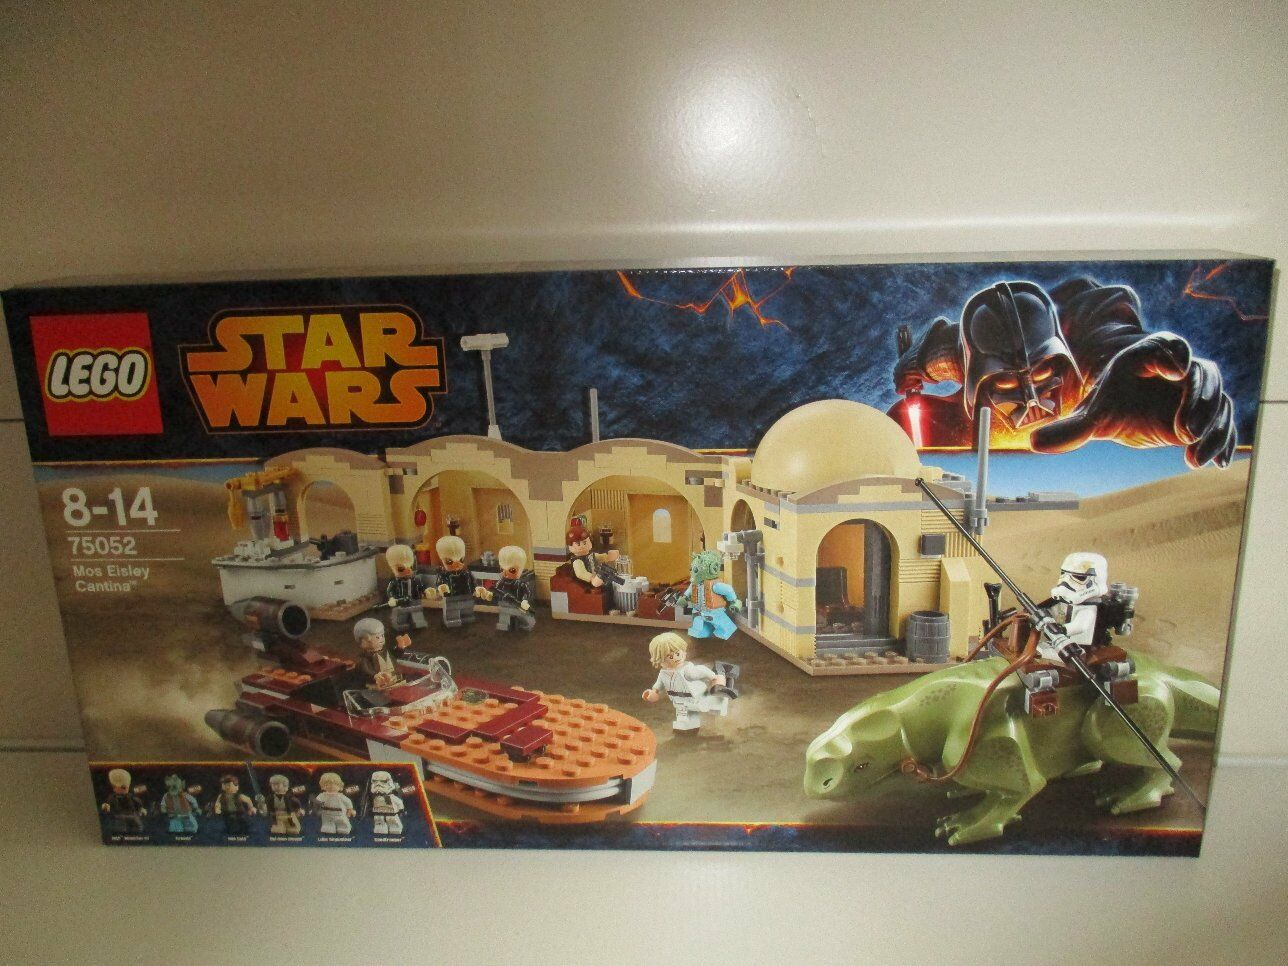 LEGO 75052 Star Wars Mos Eisley Cantina Nuovo OVP Sigillato